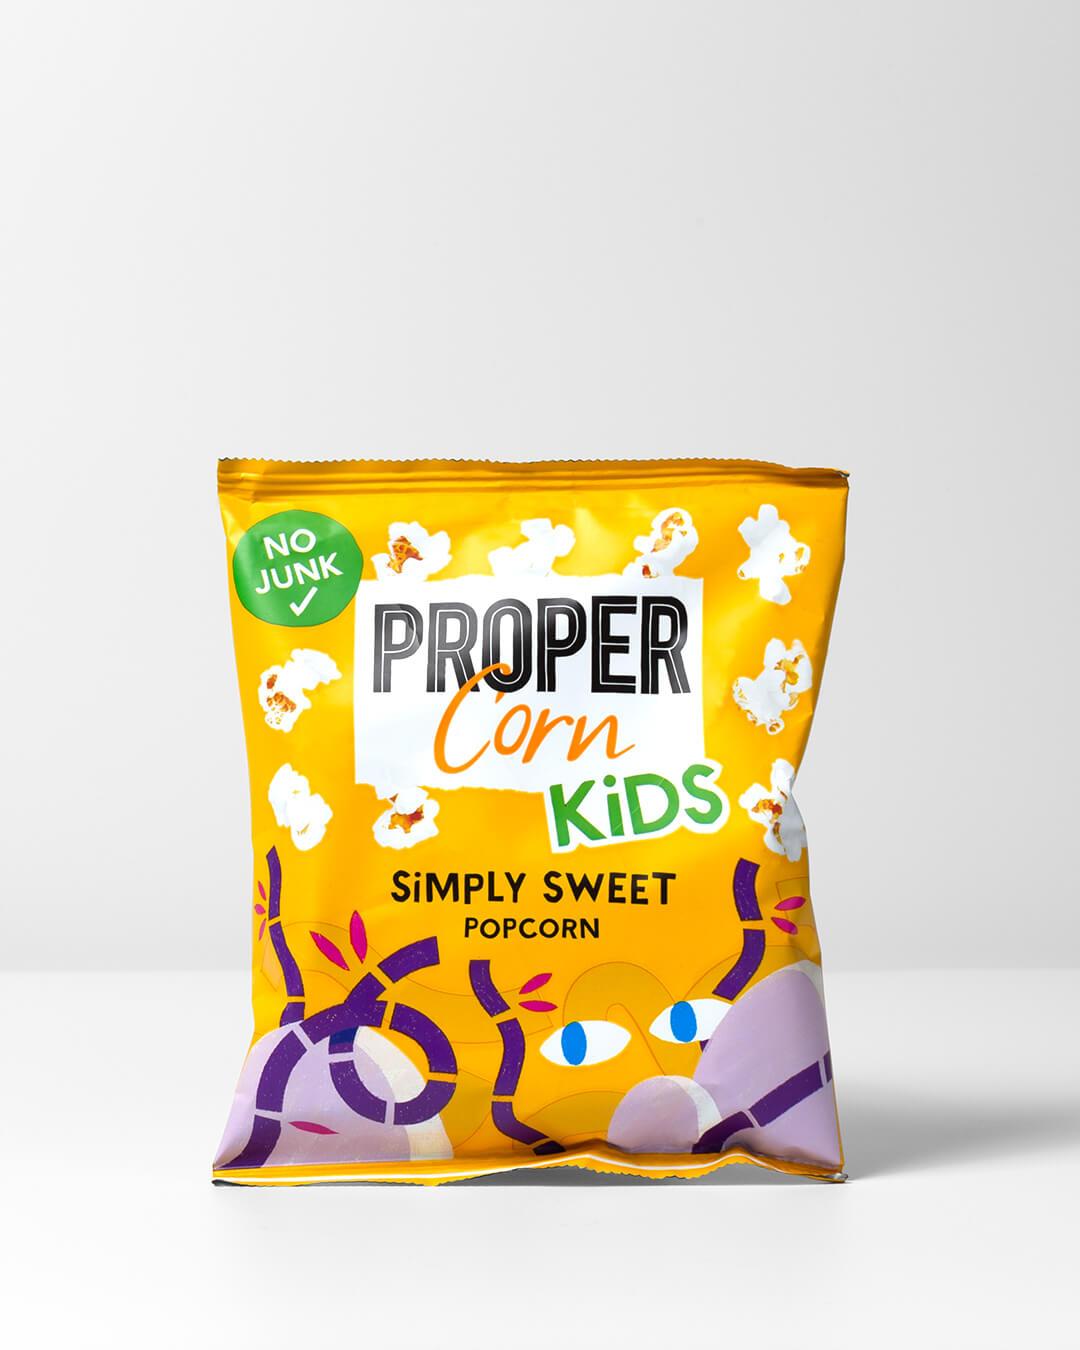 Kids Propercorn popcorn